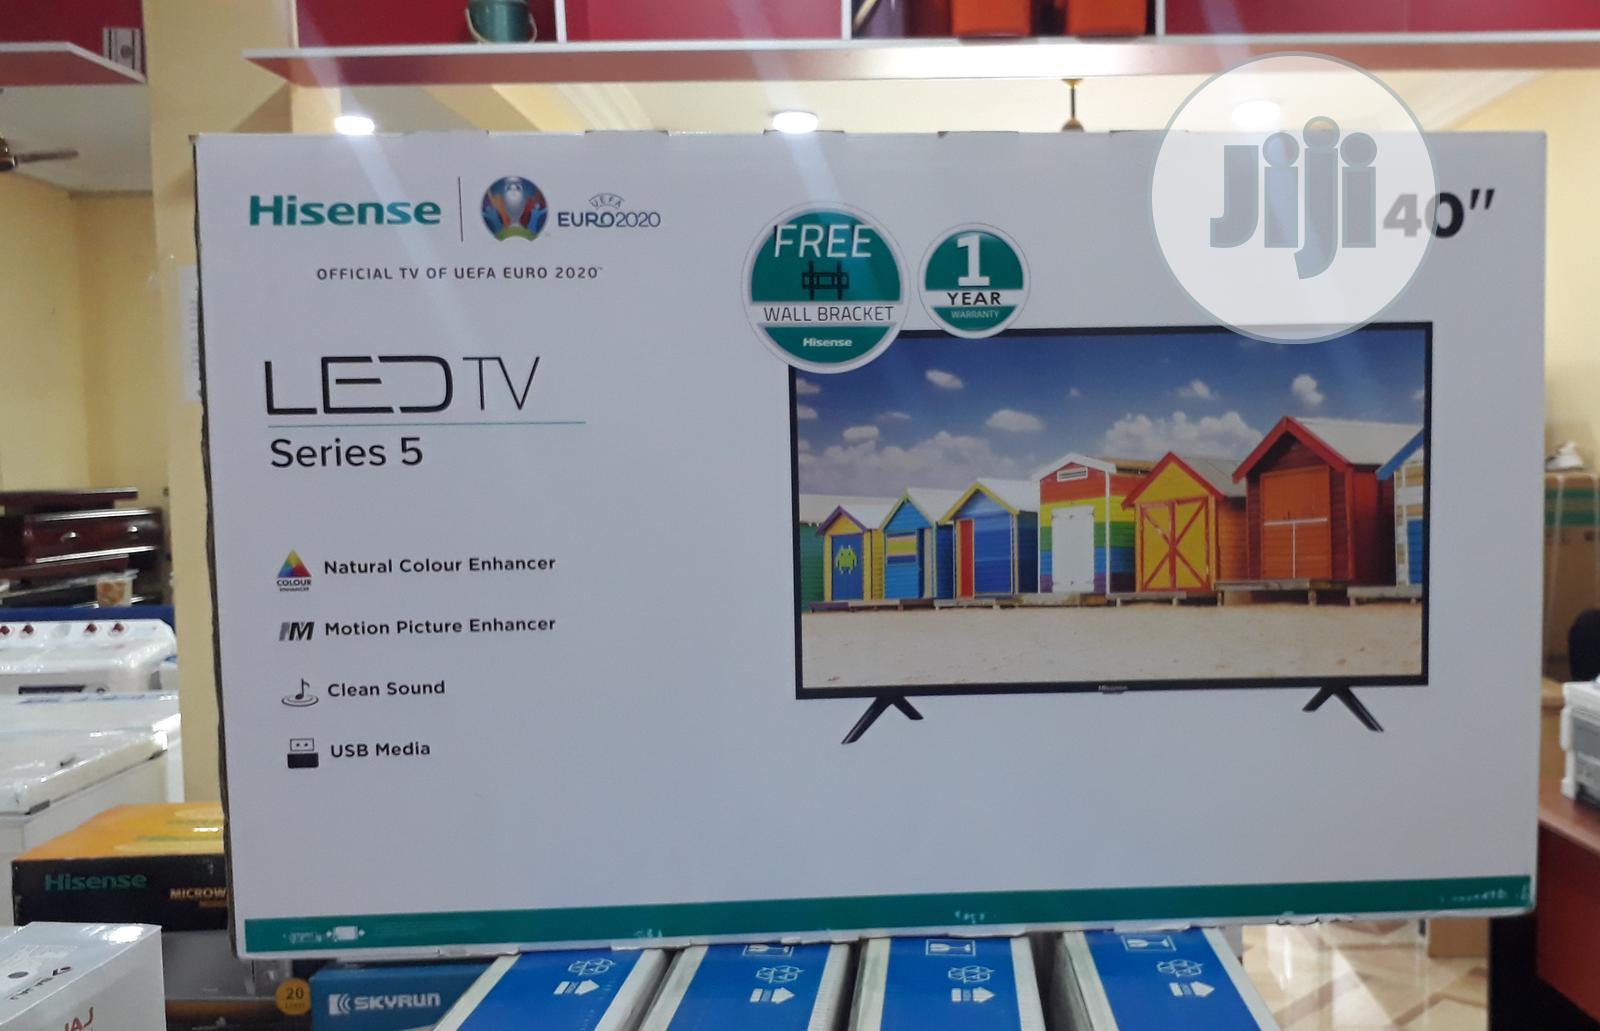 Hisense Led Tv 40 Inches